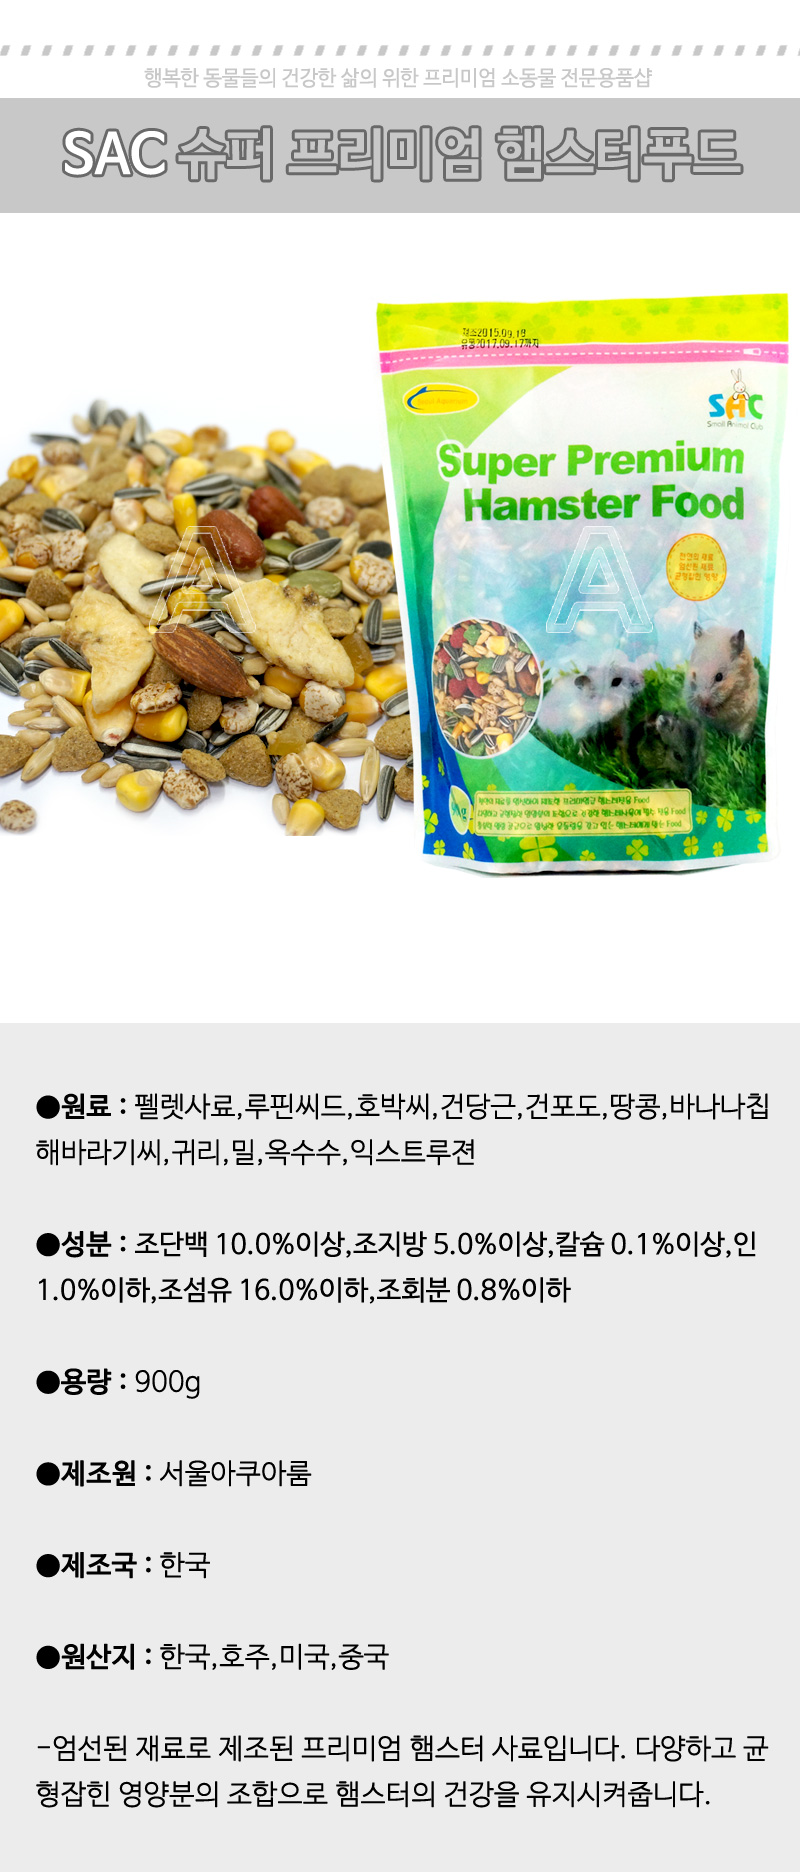 SAC 슈퍼 프리미엄 햄스터푸드 900g - 에이펫, 7,500원, 햄스터/다람쥐용품, 사료/건초